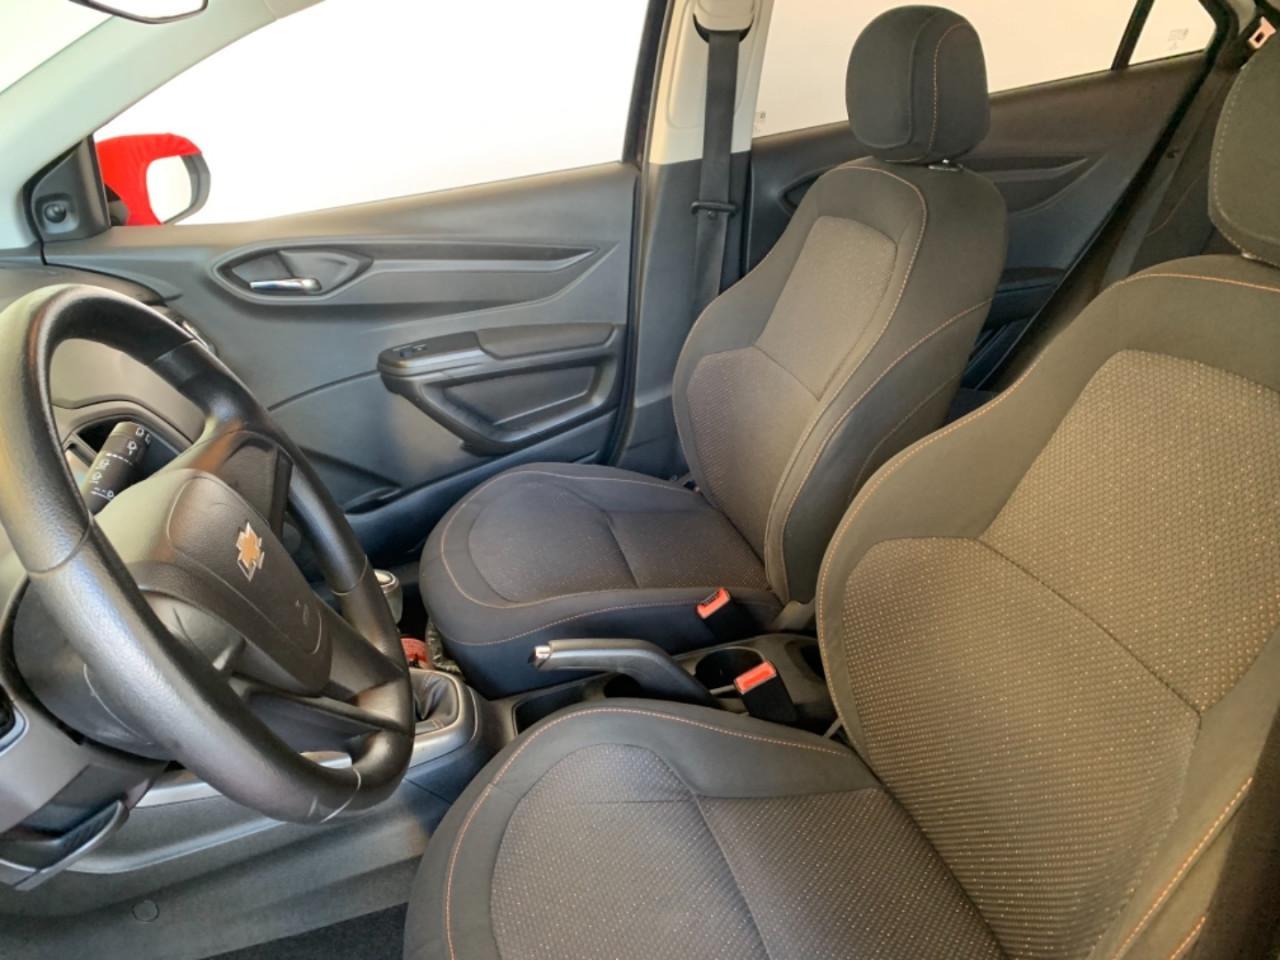 CHEVROLET Onix Hatch 1.4 4P FLEX LT, Foto 4